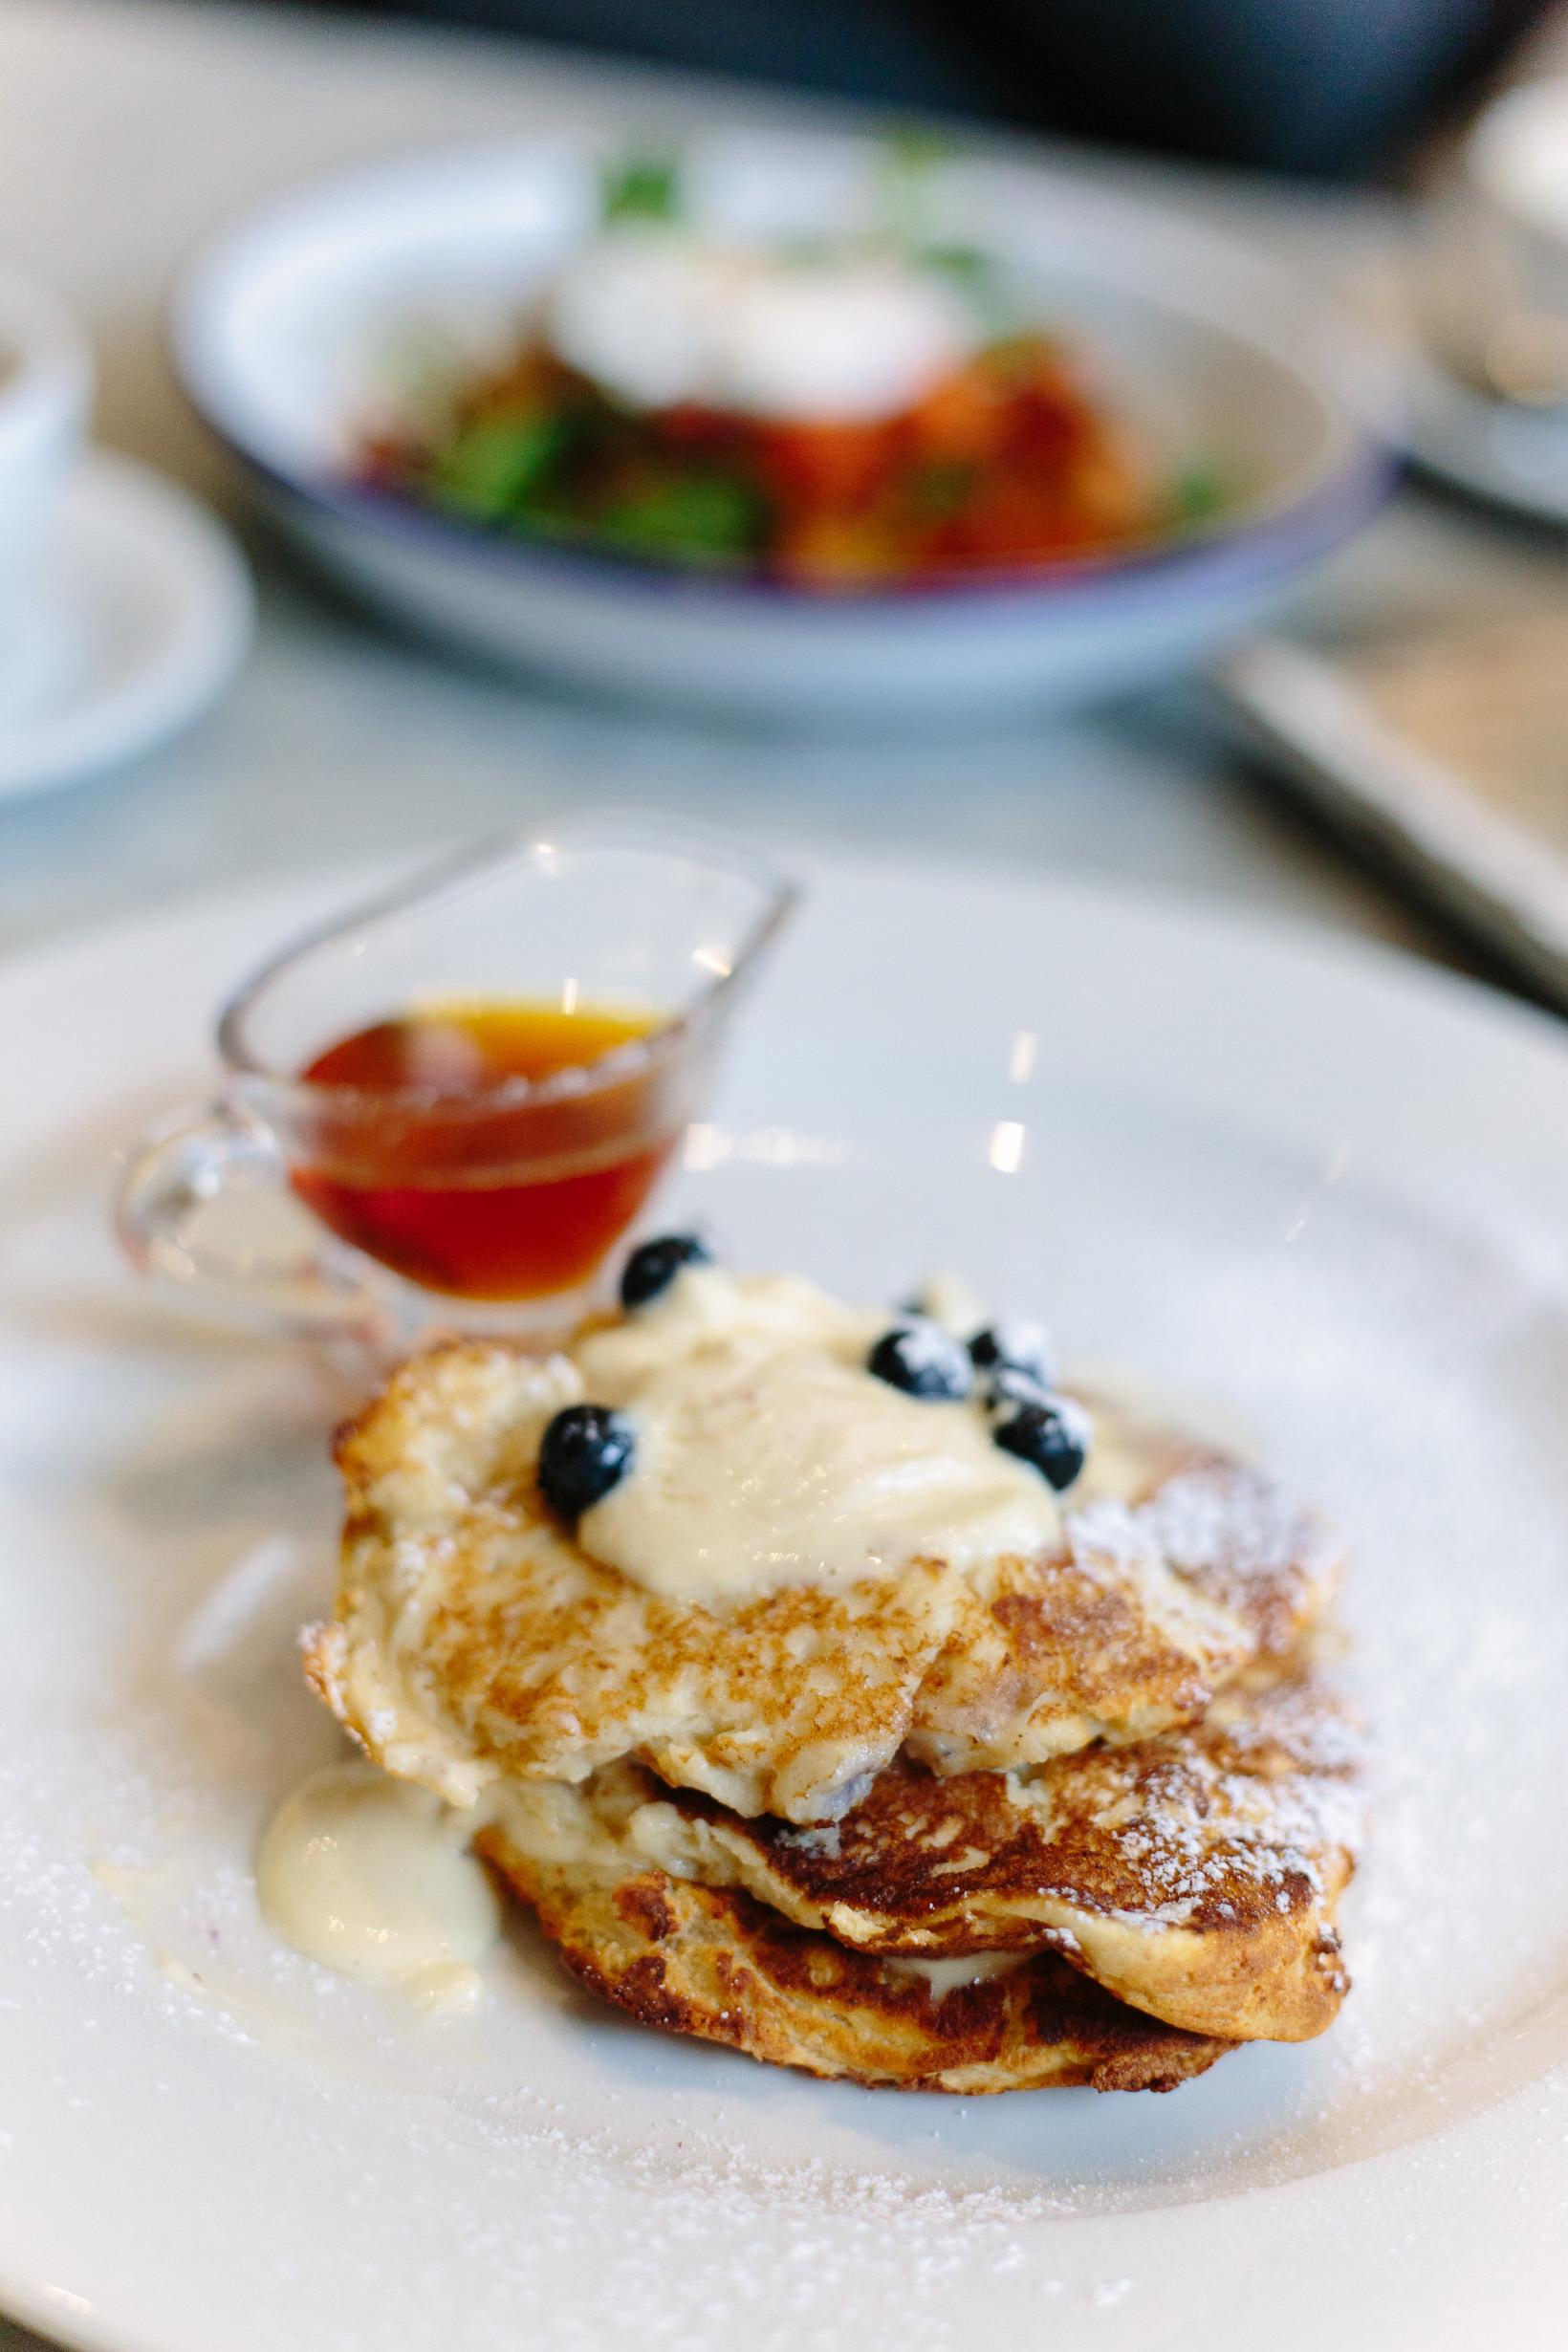 Blueberry-Ricotta Pancakes Blueberry-Ricotta Pancakes new pics